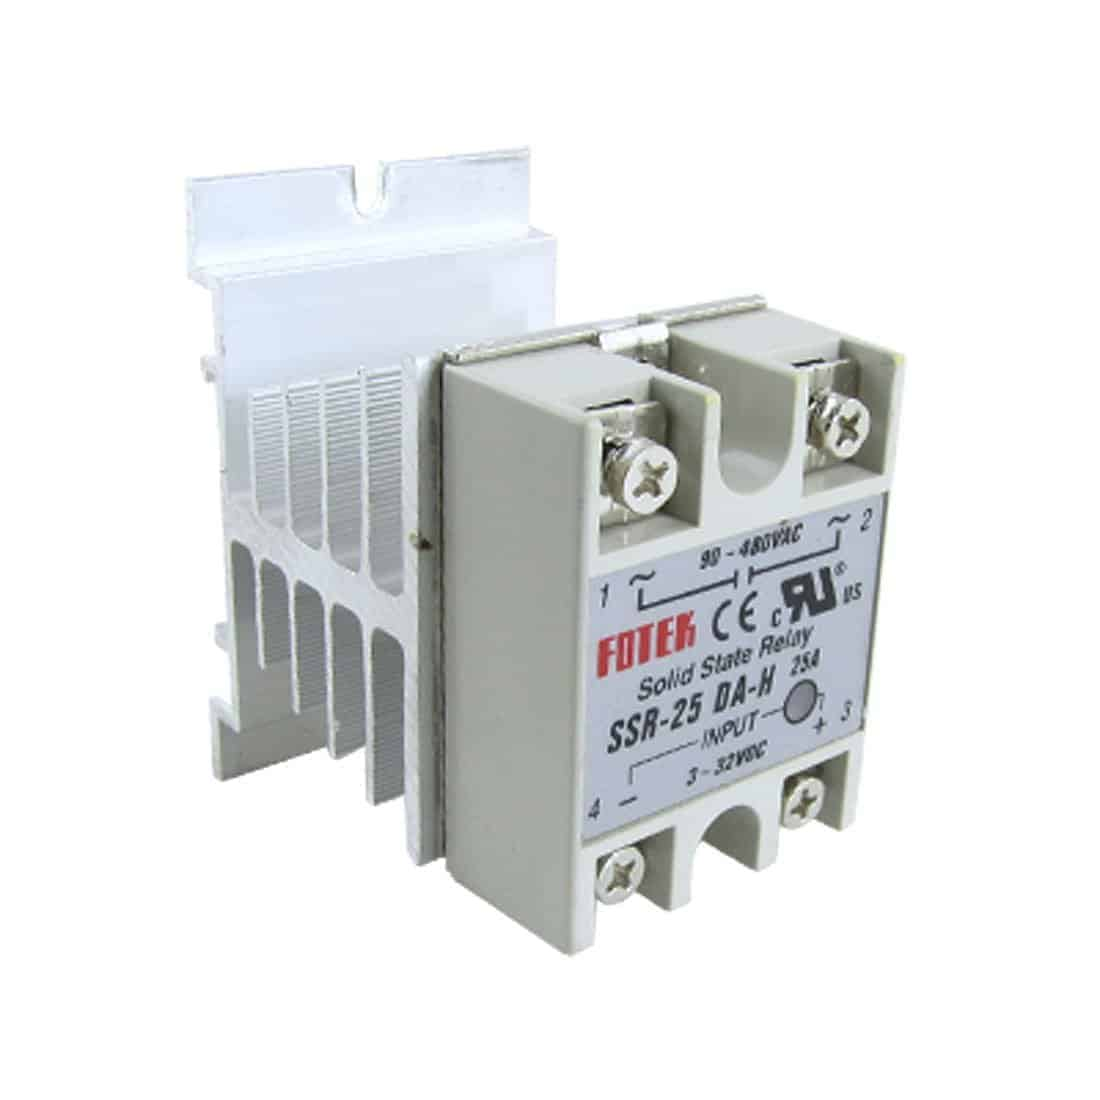 Heat Sink Ssr New Schneider Electric Zelior Solidstate Relays Images